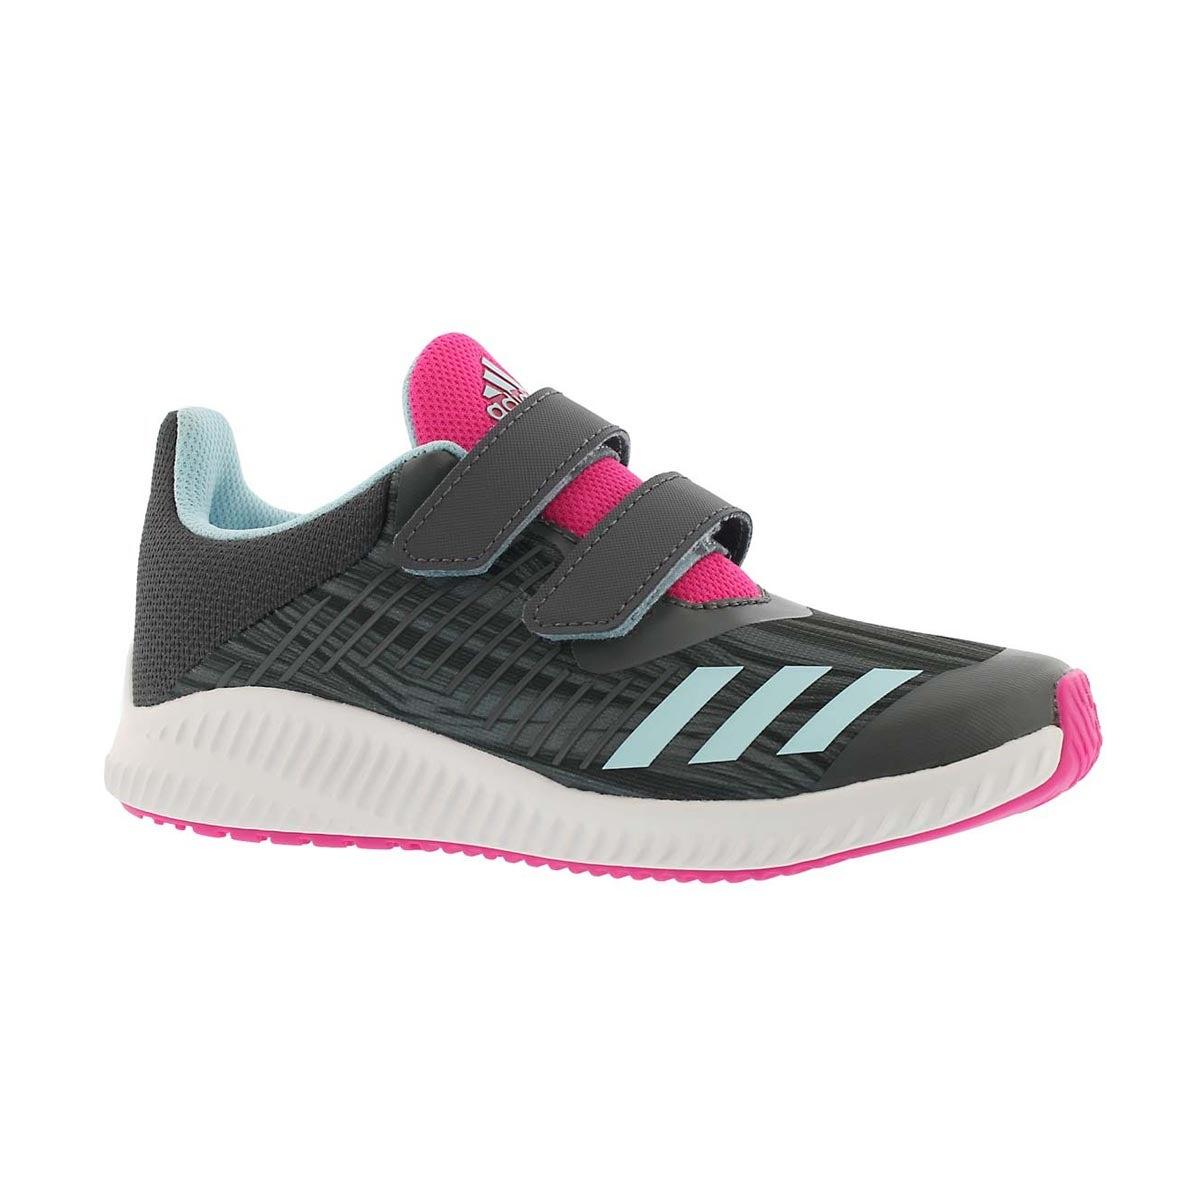 Girls' FORTA RUN CF grey/blue sneakers